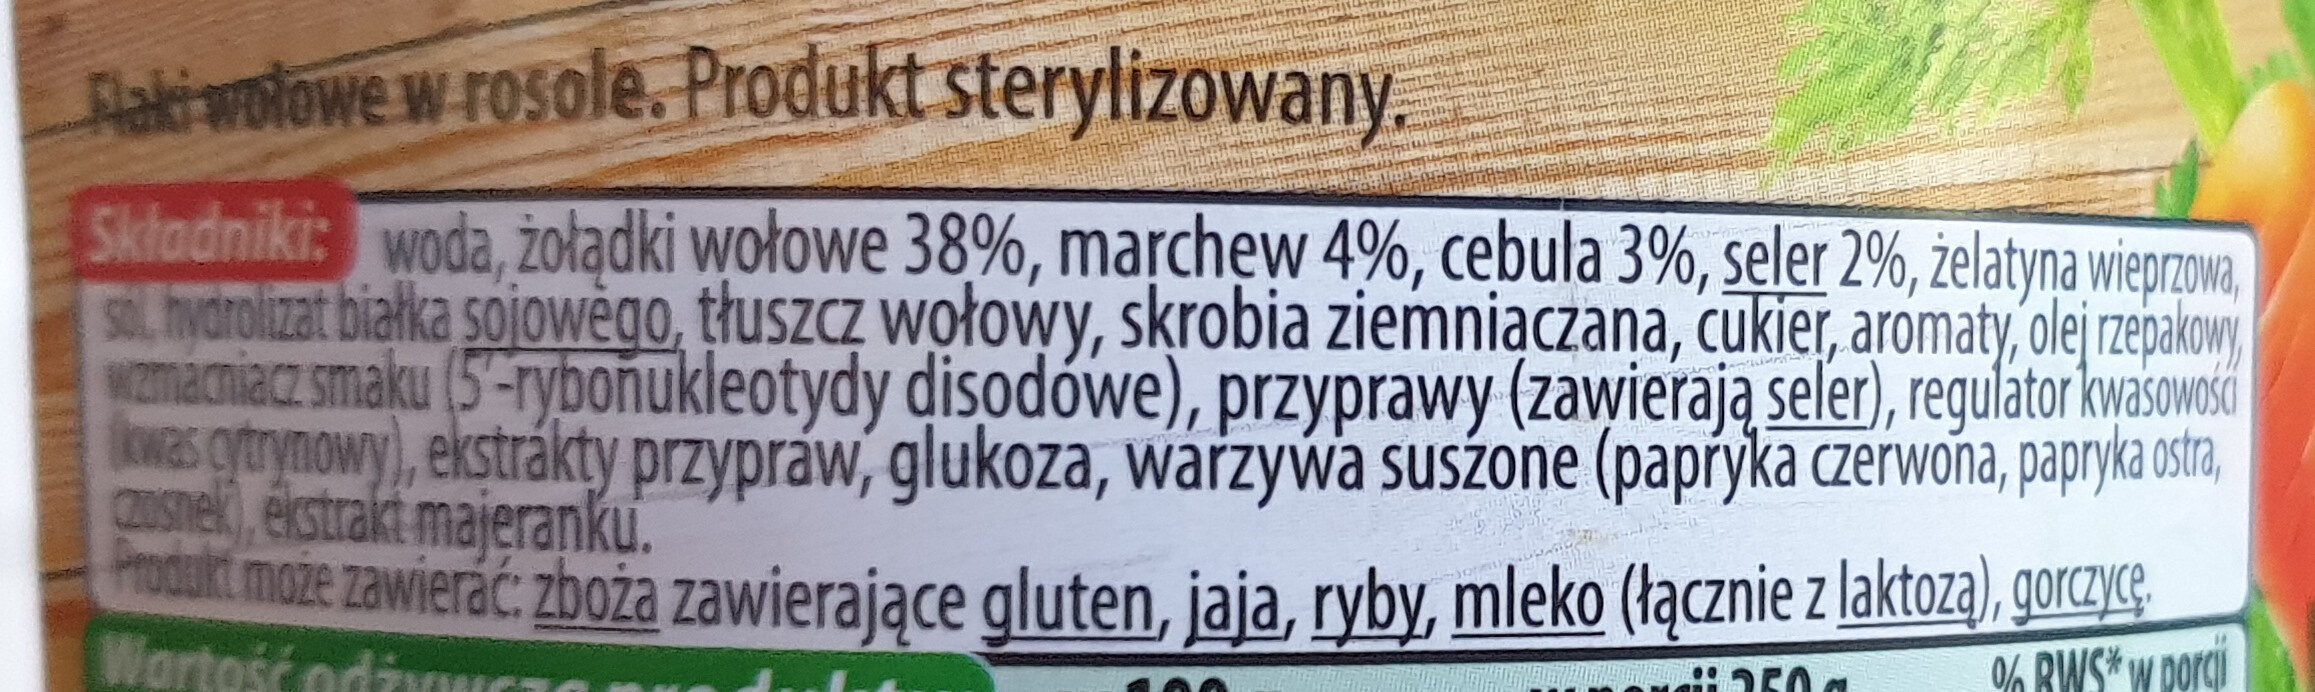 Flaki wołowe - Ingrédients - pl